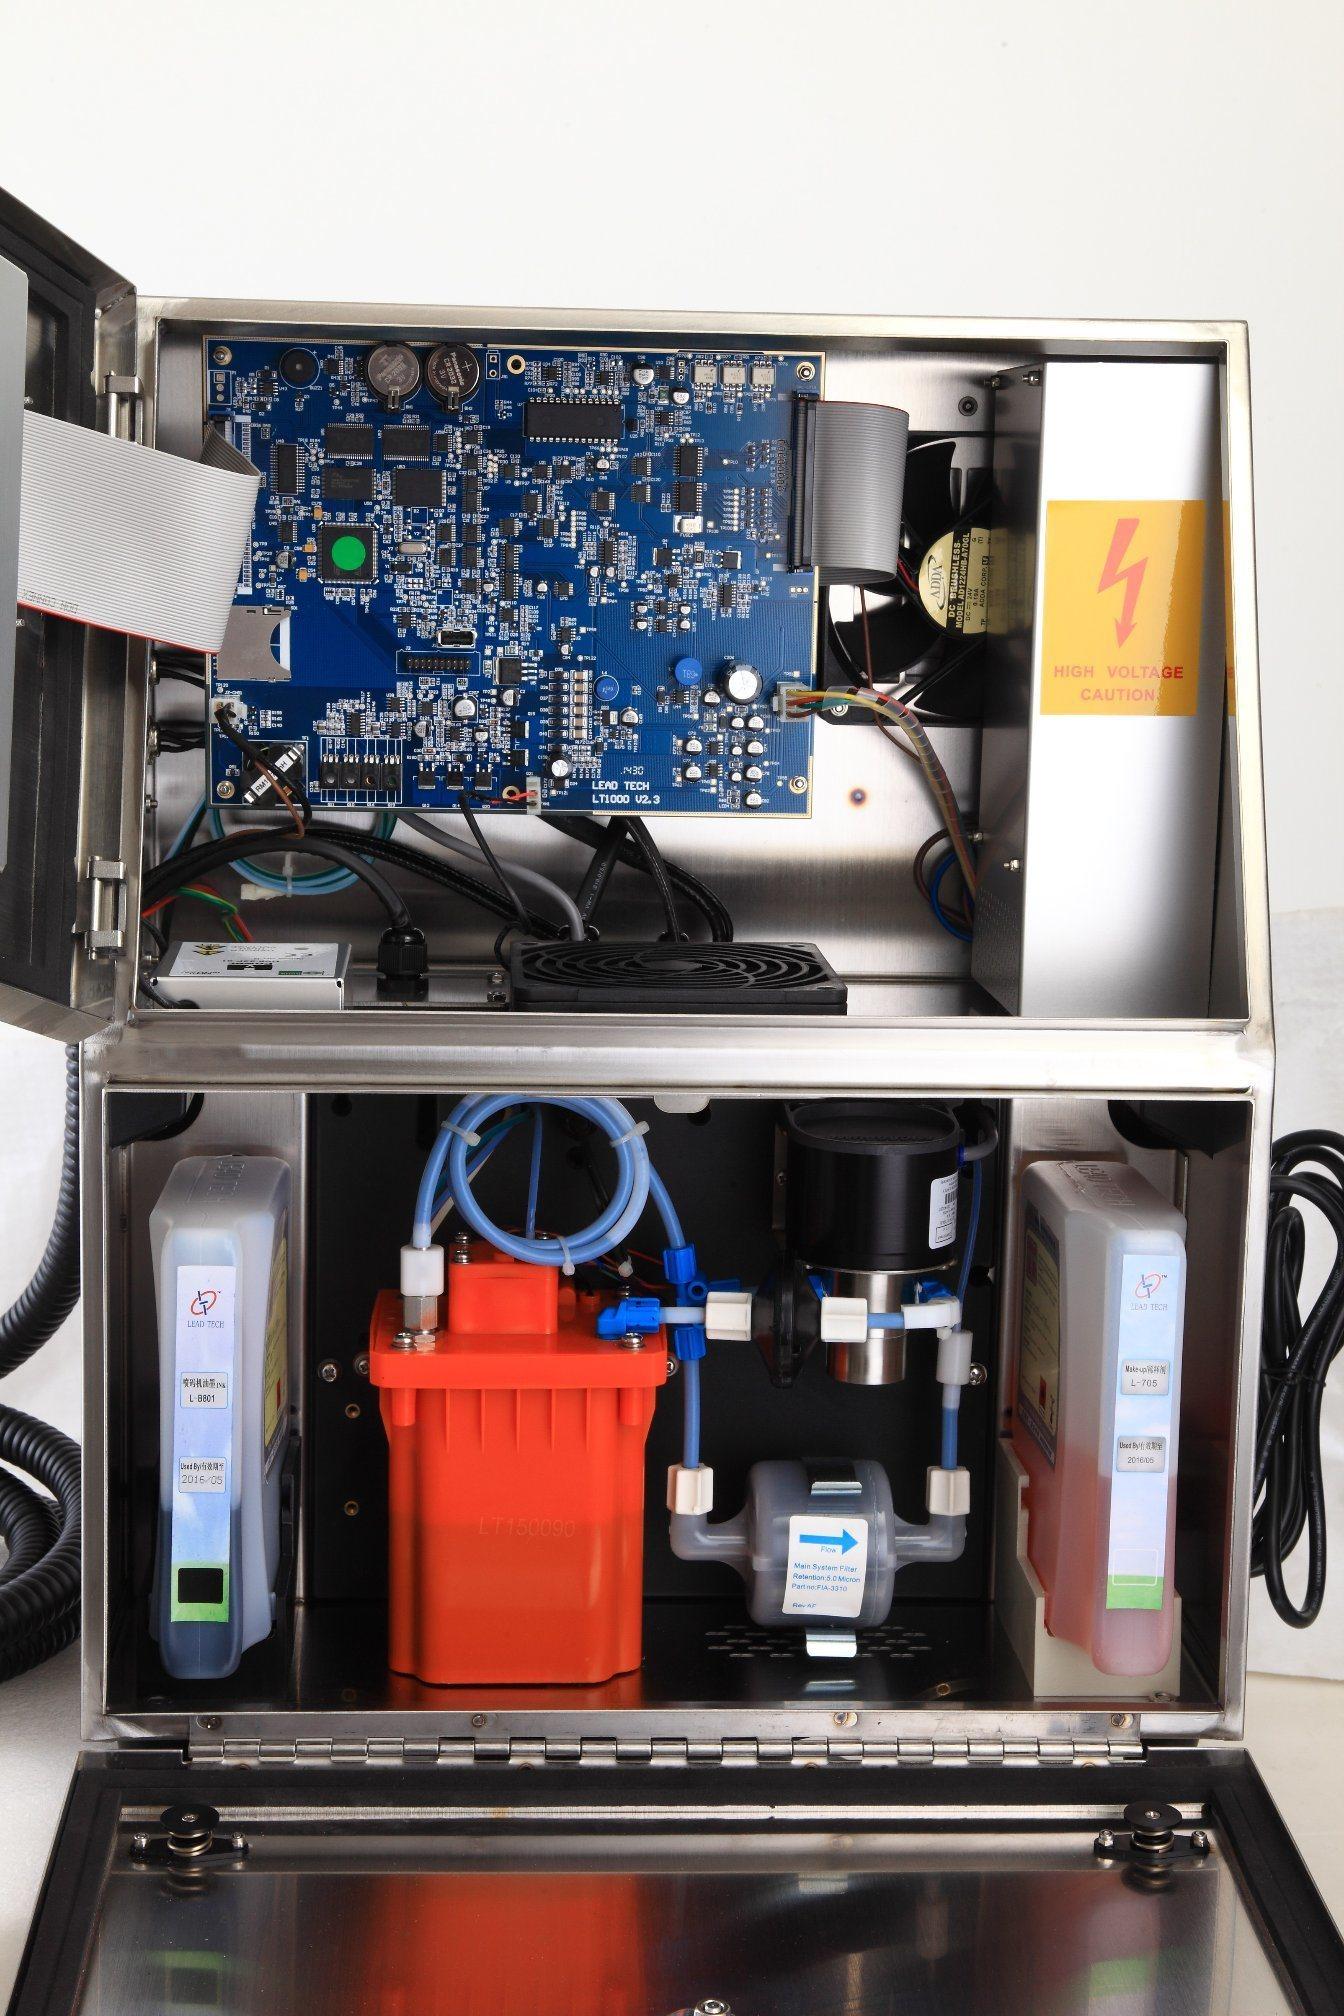 Lead Tech Lt1000s+ PE Pipe Coding Cij Inkjet Printer